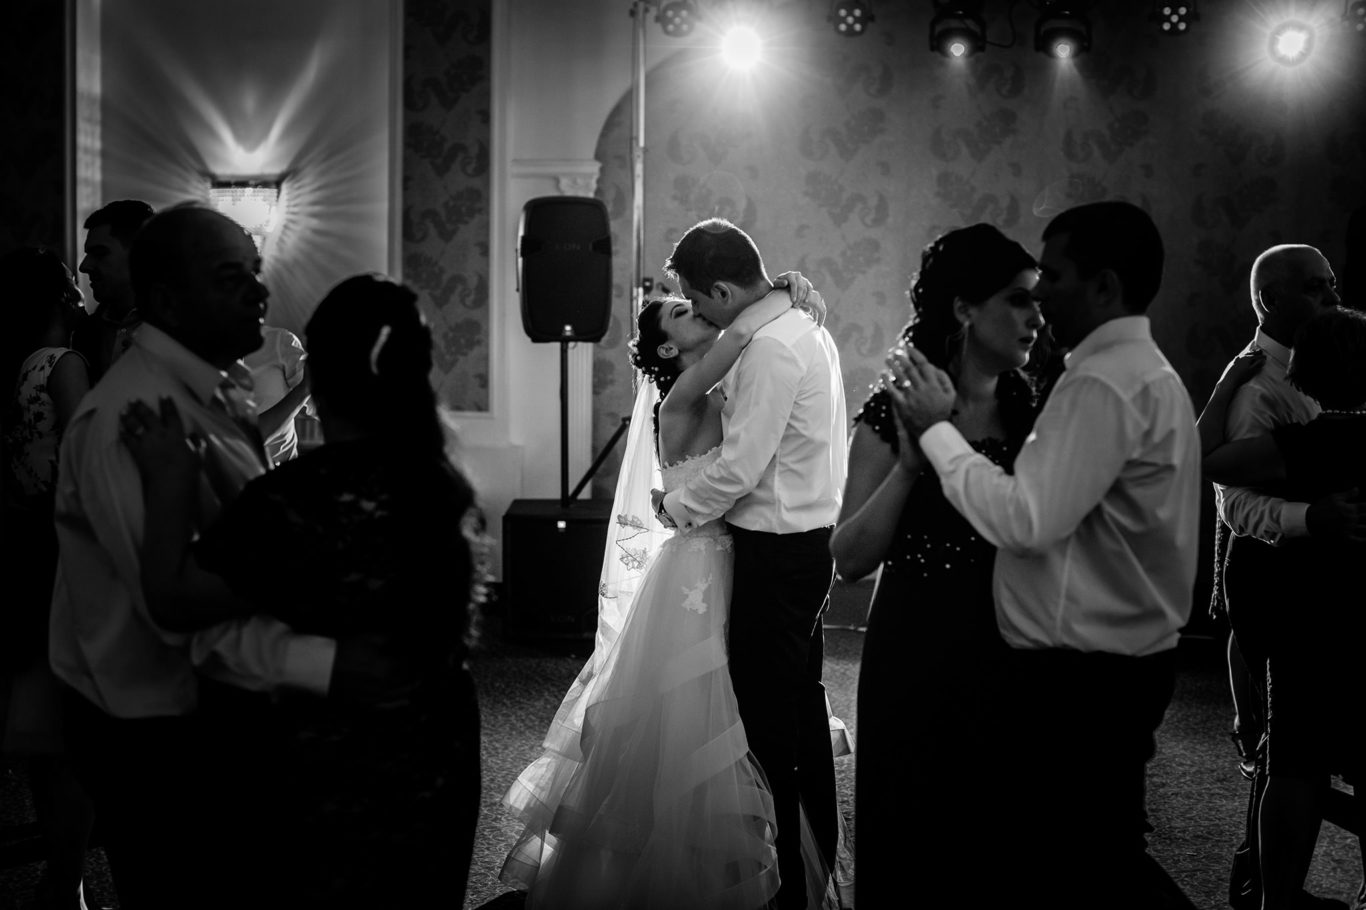 0603-fotografie-nunta-bucuresti-cristina-nicusor-fotograf-ciprian-dumitrescu-cd2_0387-2